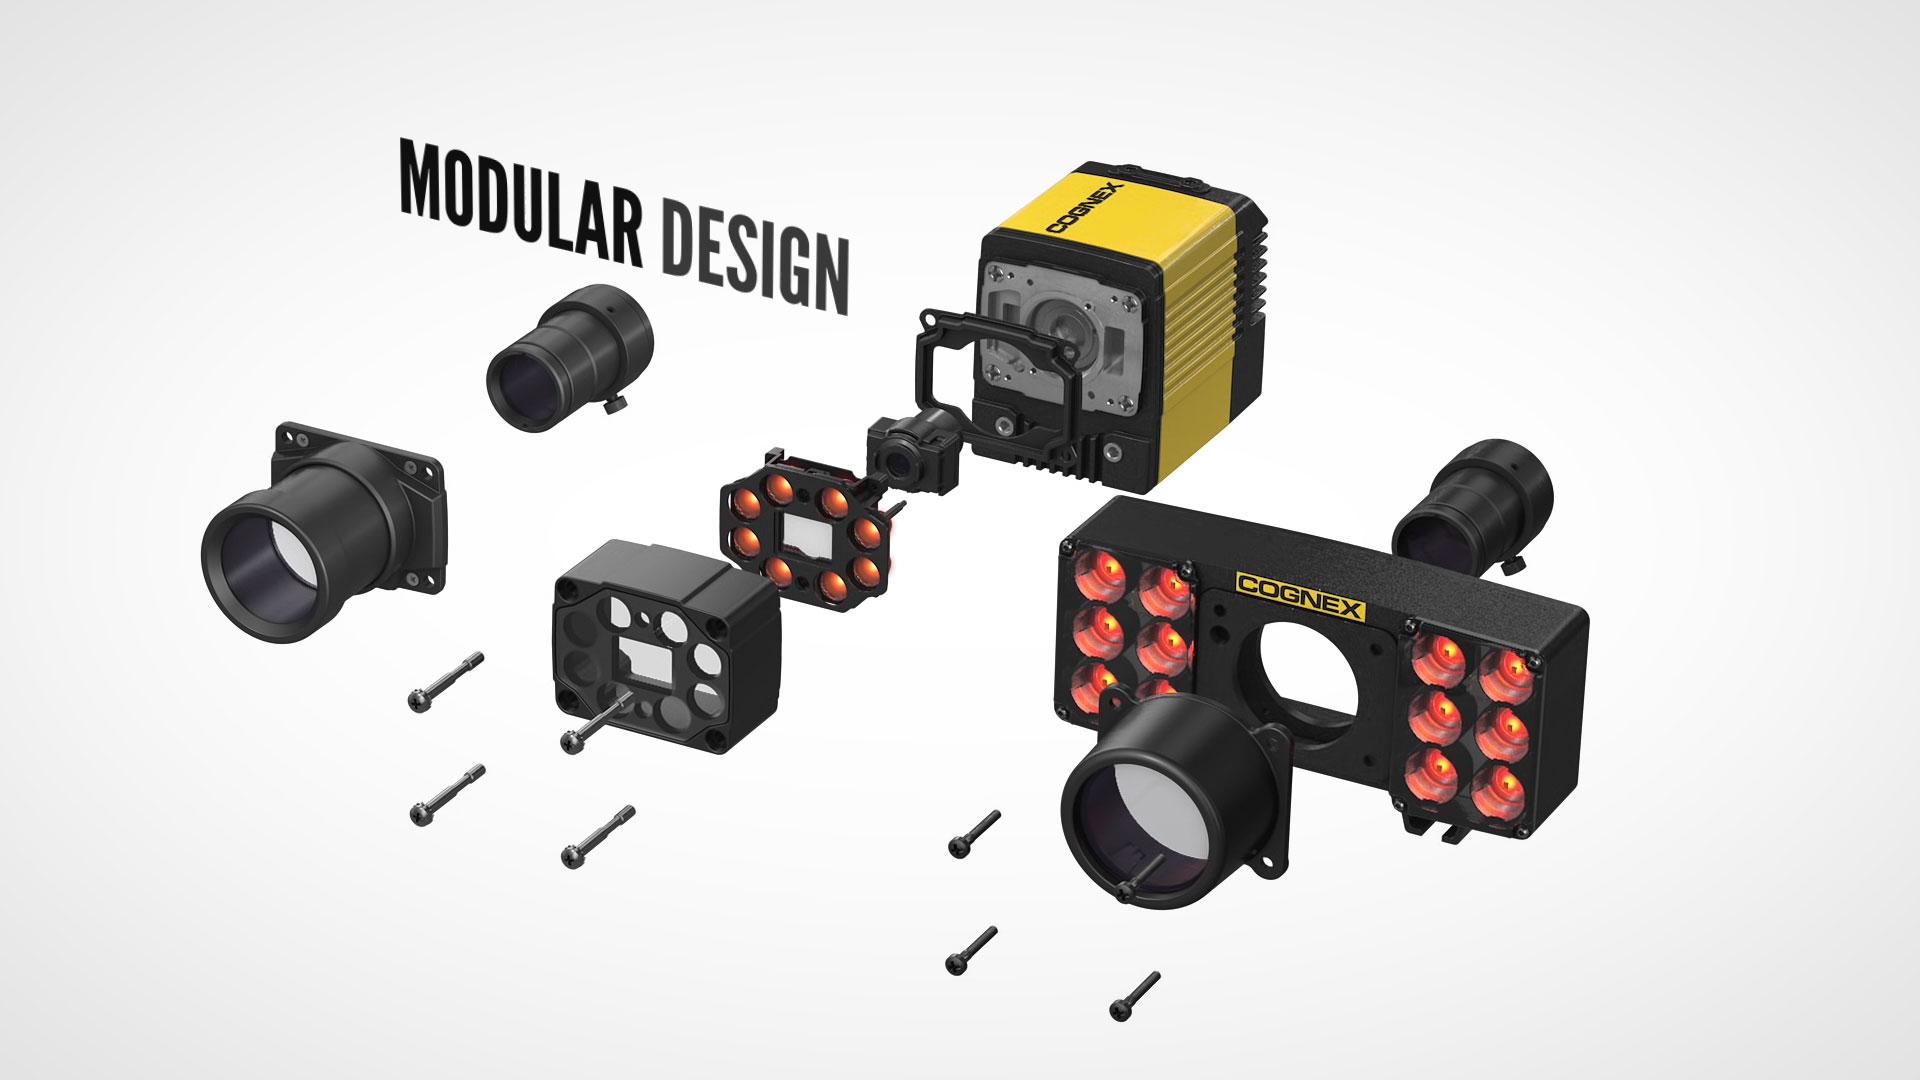 DataMan 470 Series modular design of available parts